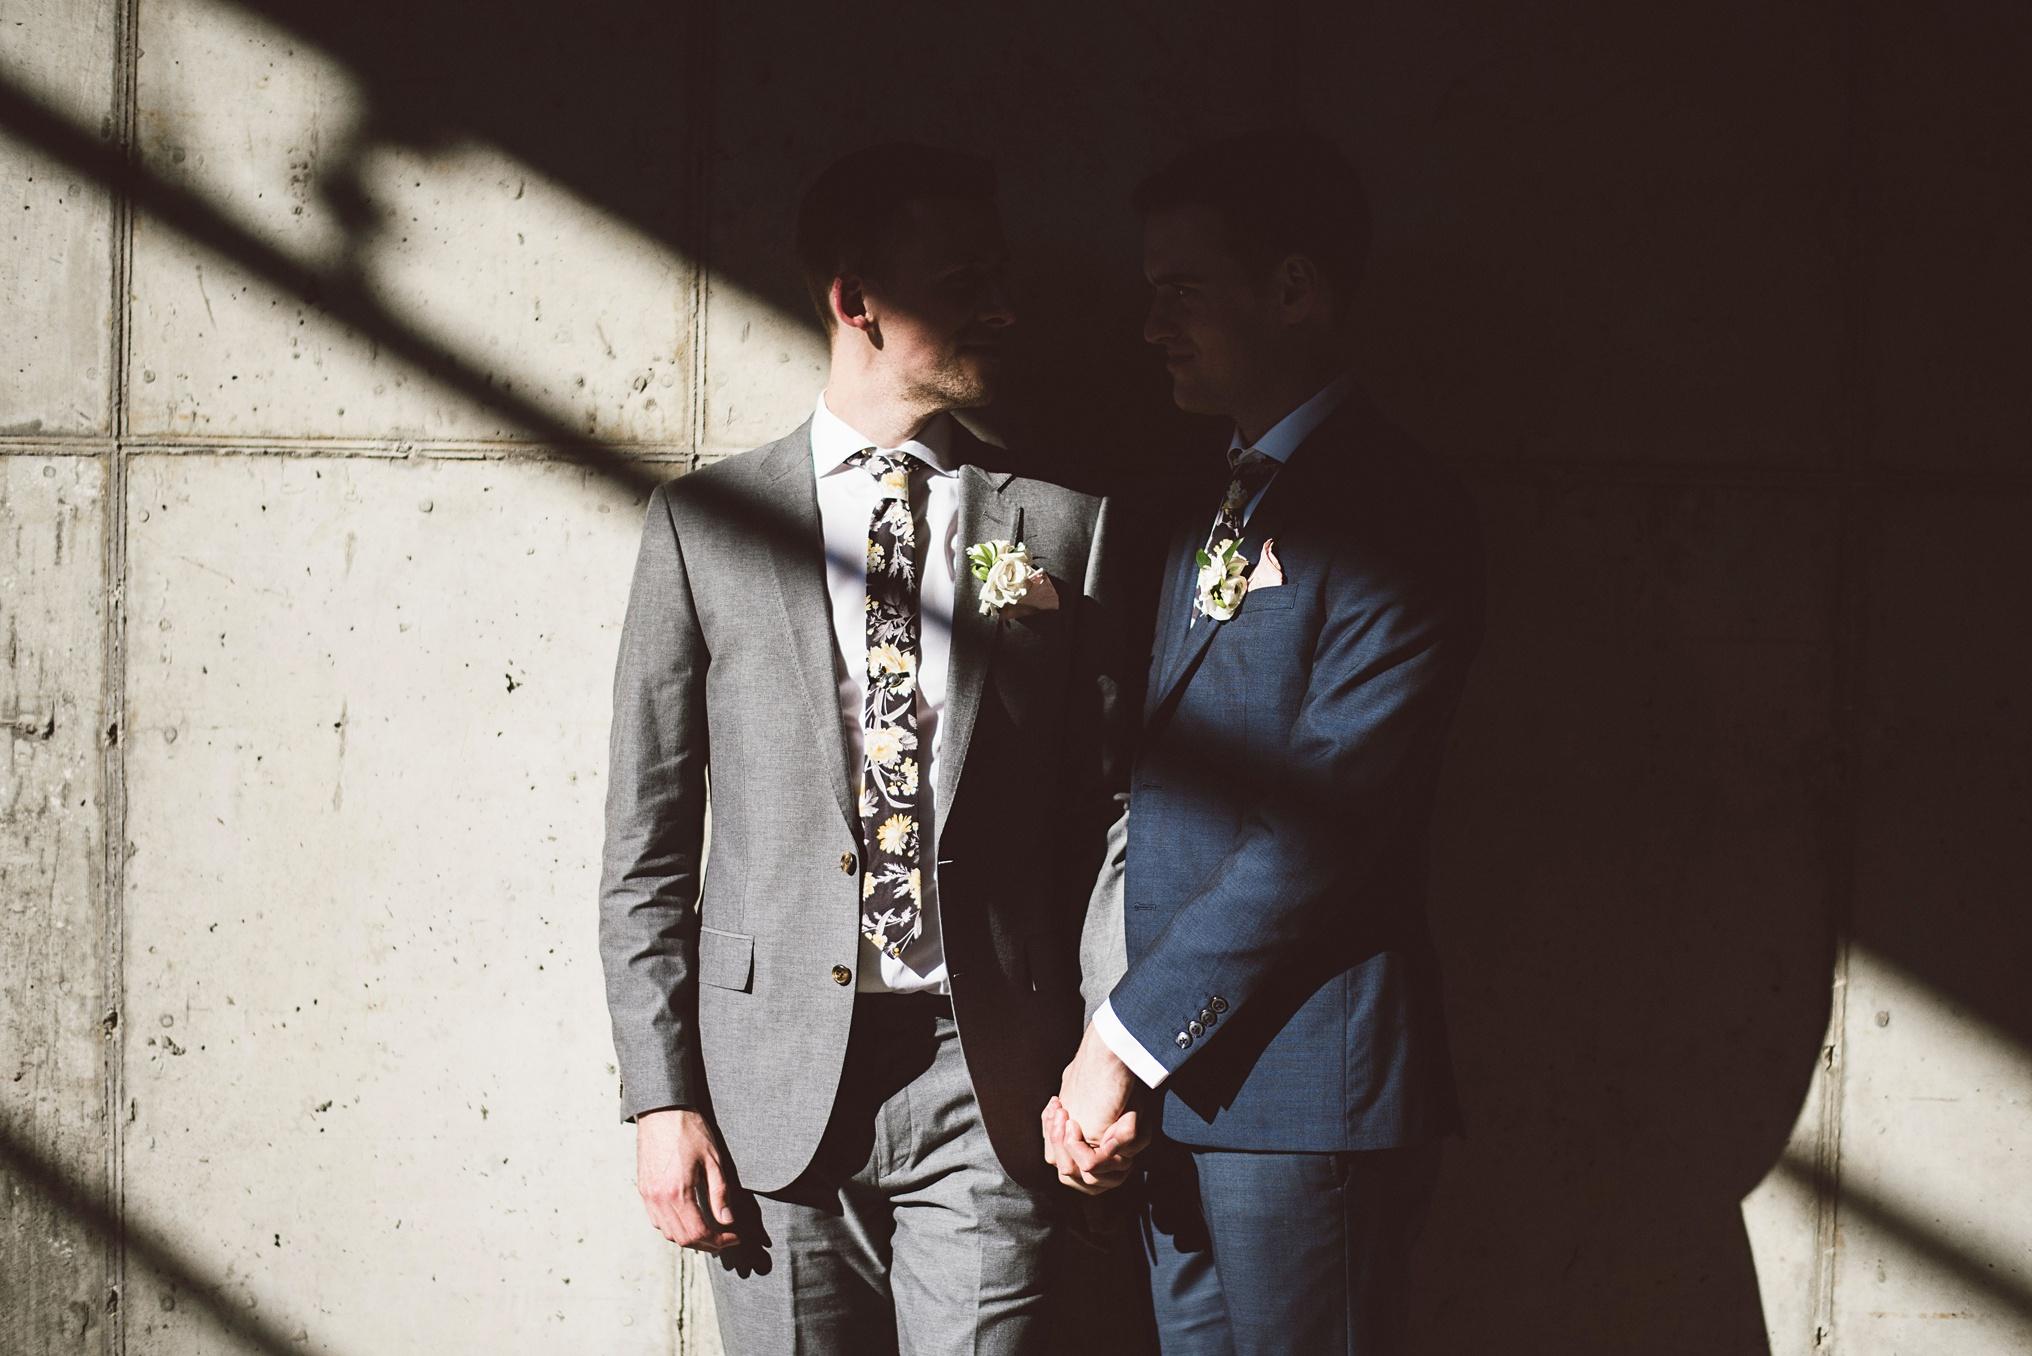 best_wedding_photography_2017_by_lucas_botz_photography_212.jpg